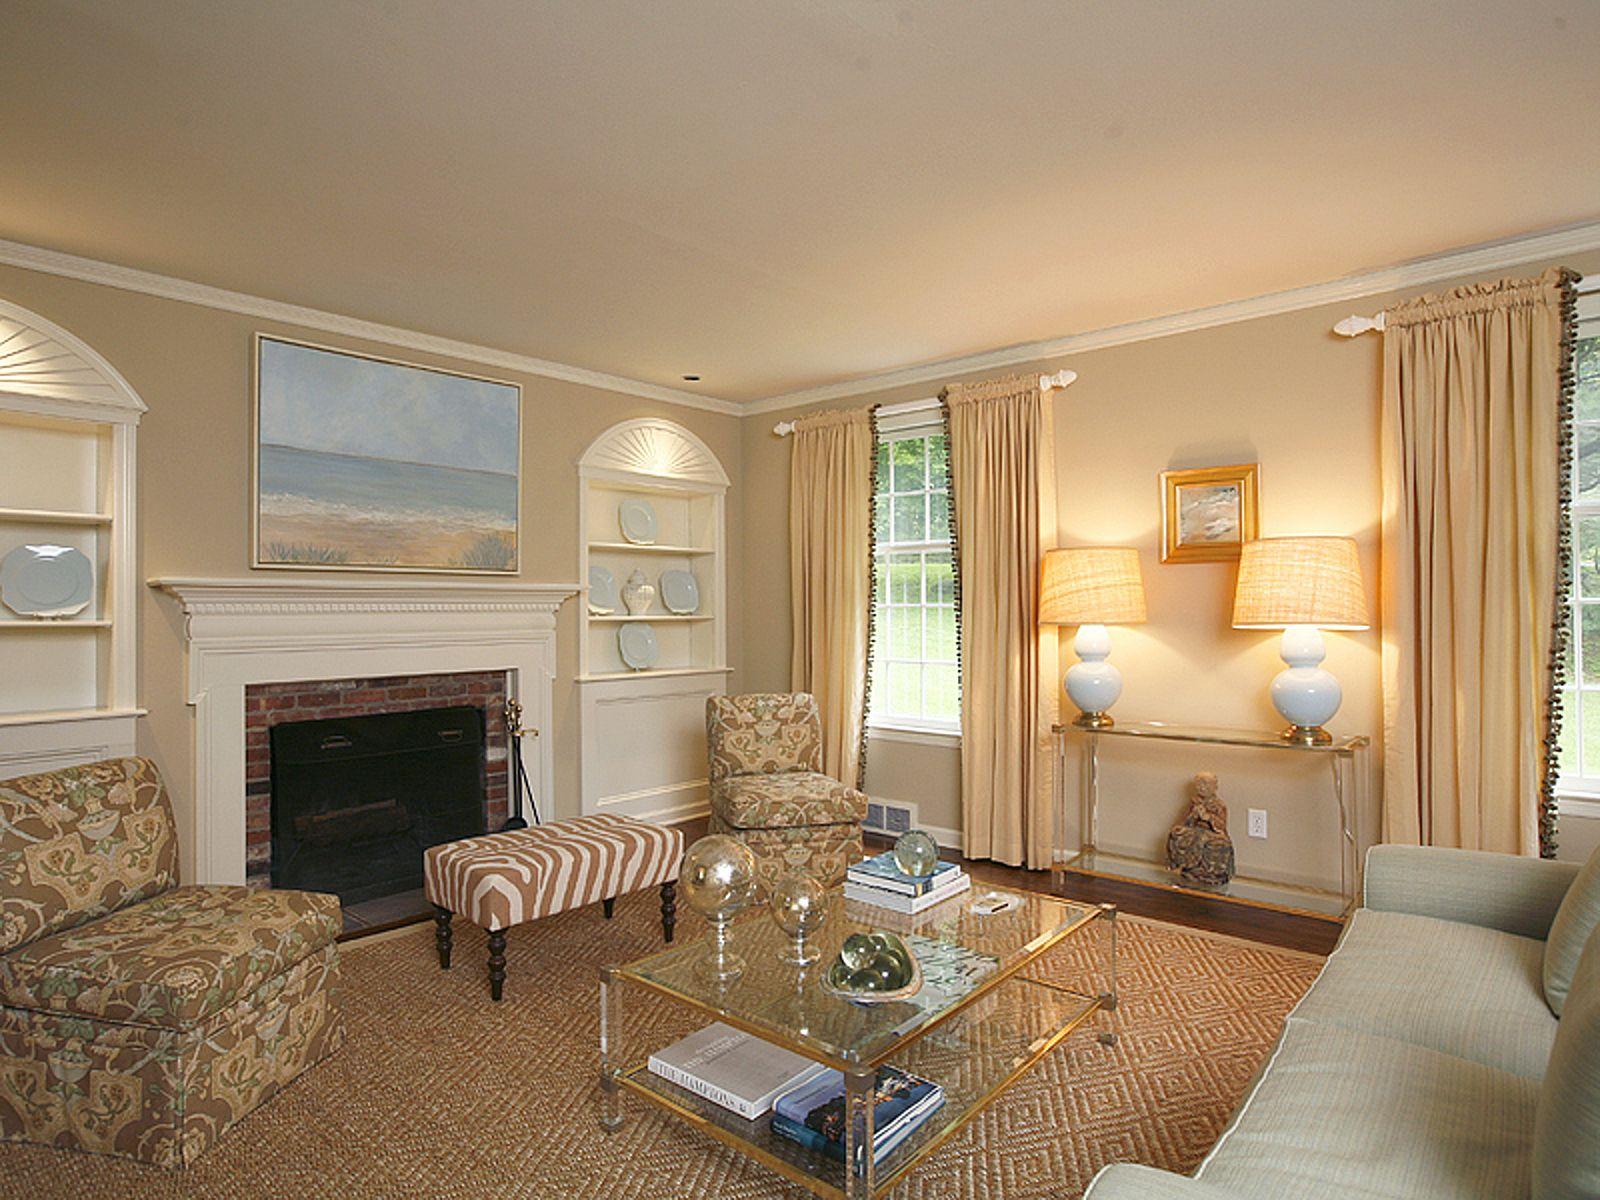 Home Interior Designs Formal Living Room Ideas In Elegant